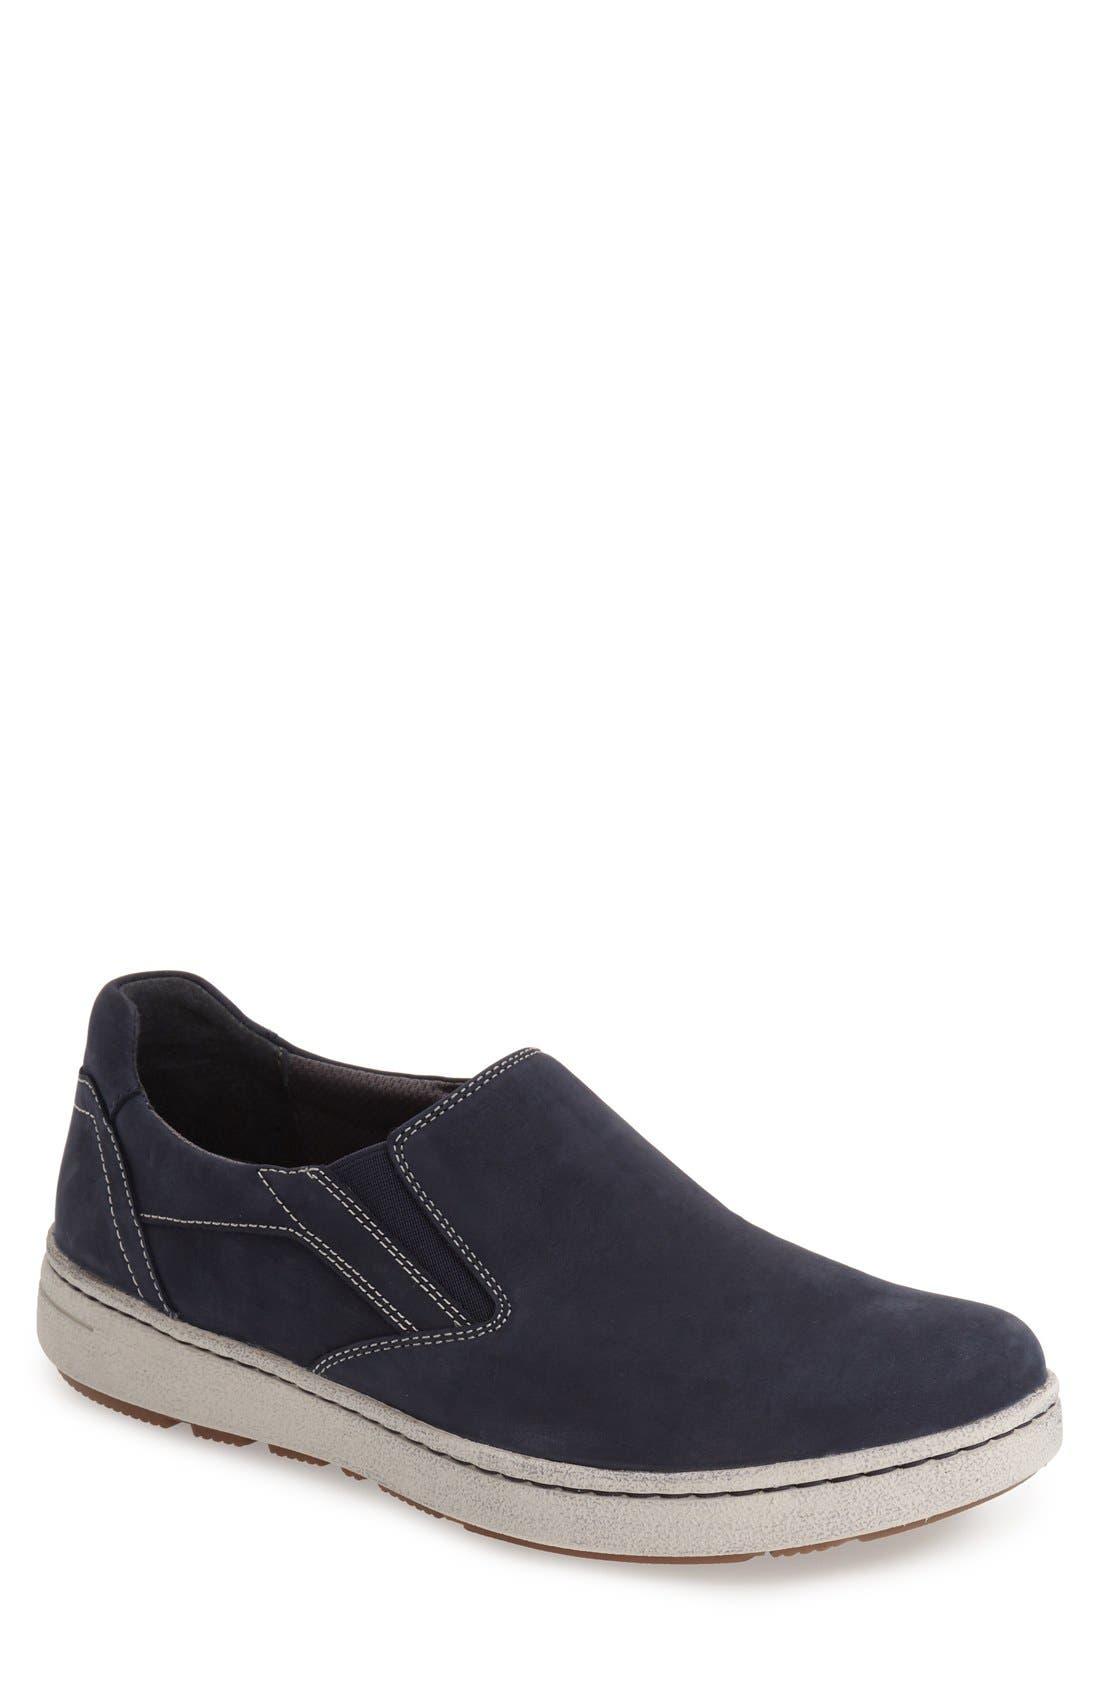 DANSKO 'Viktor' Water Resistant Slip-On Sneaker